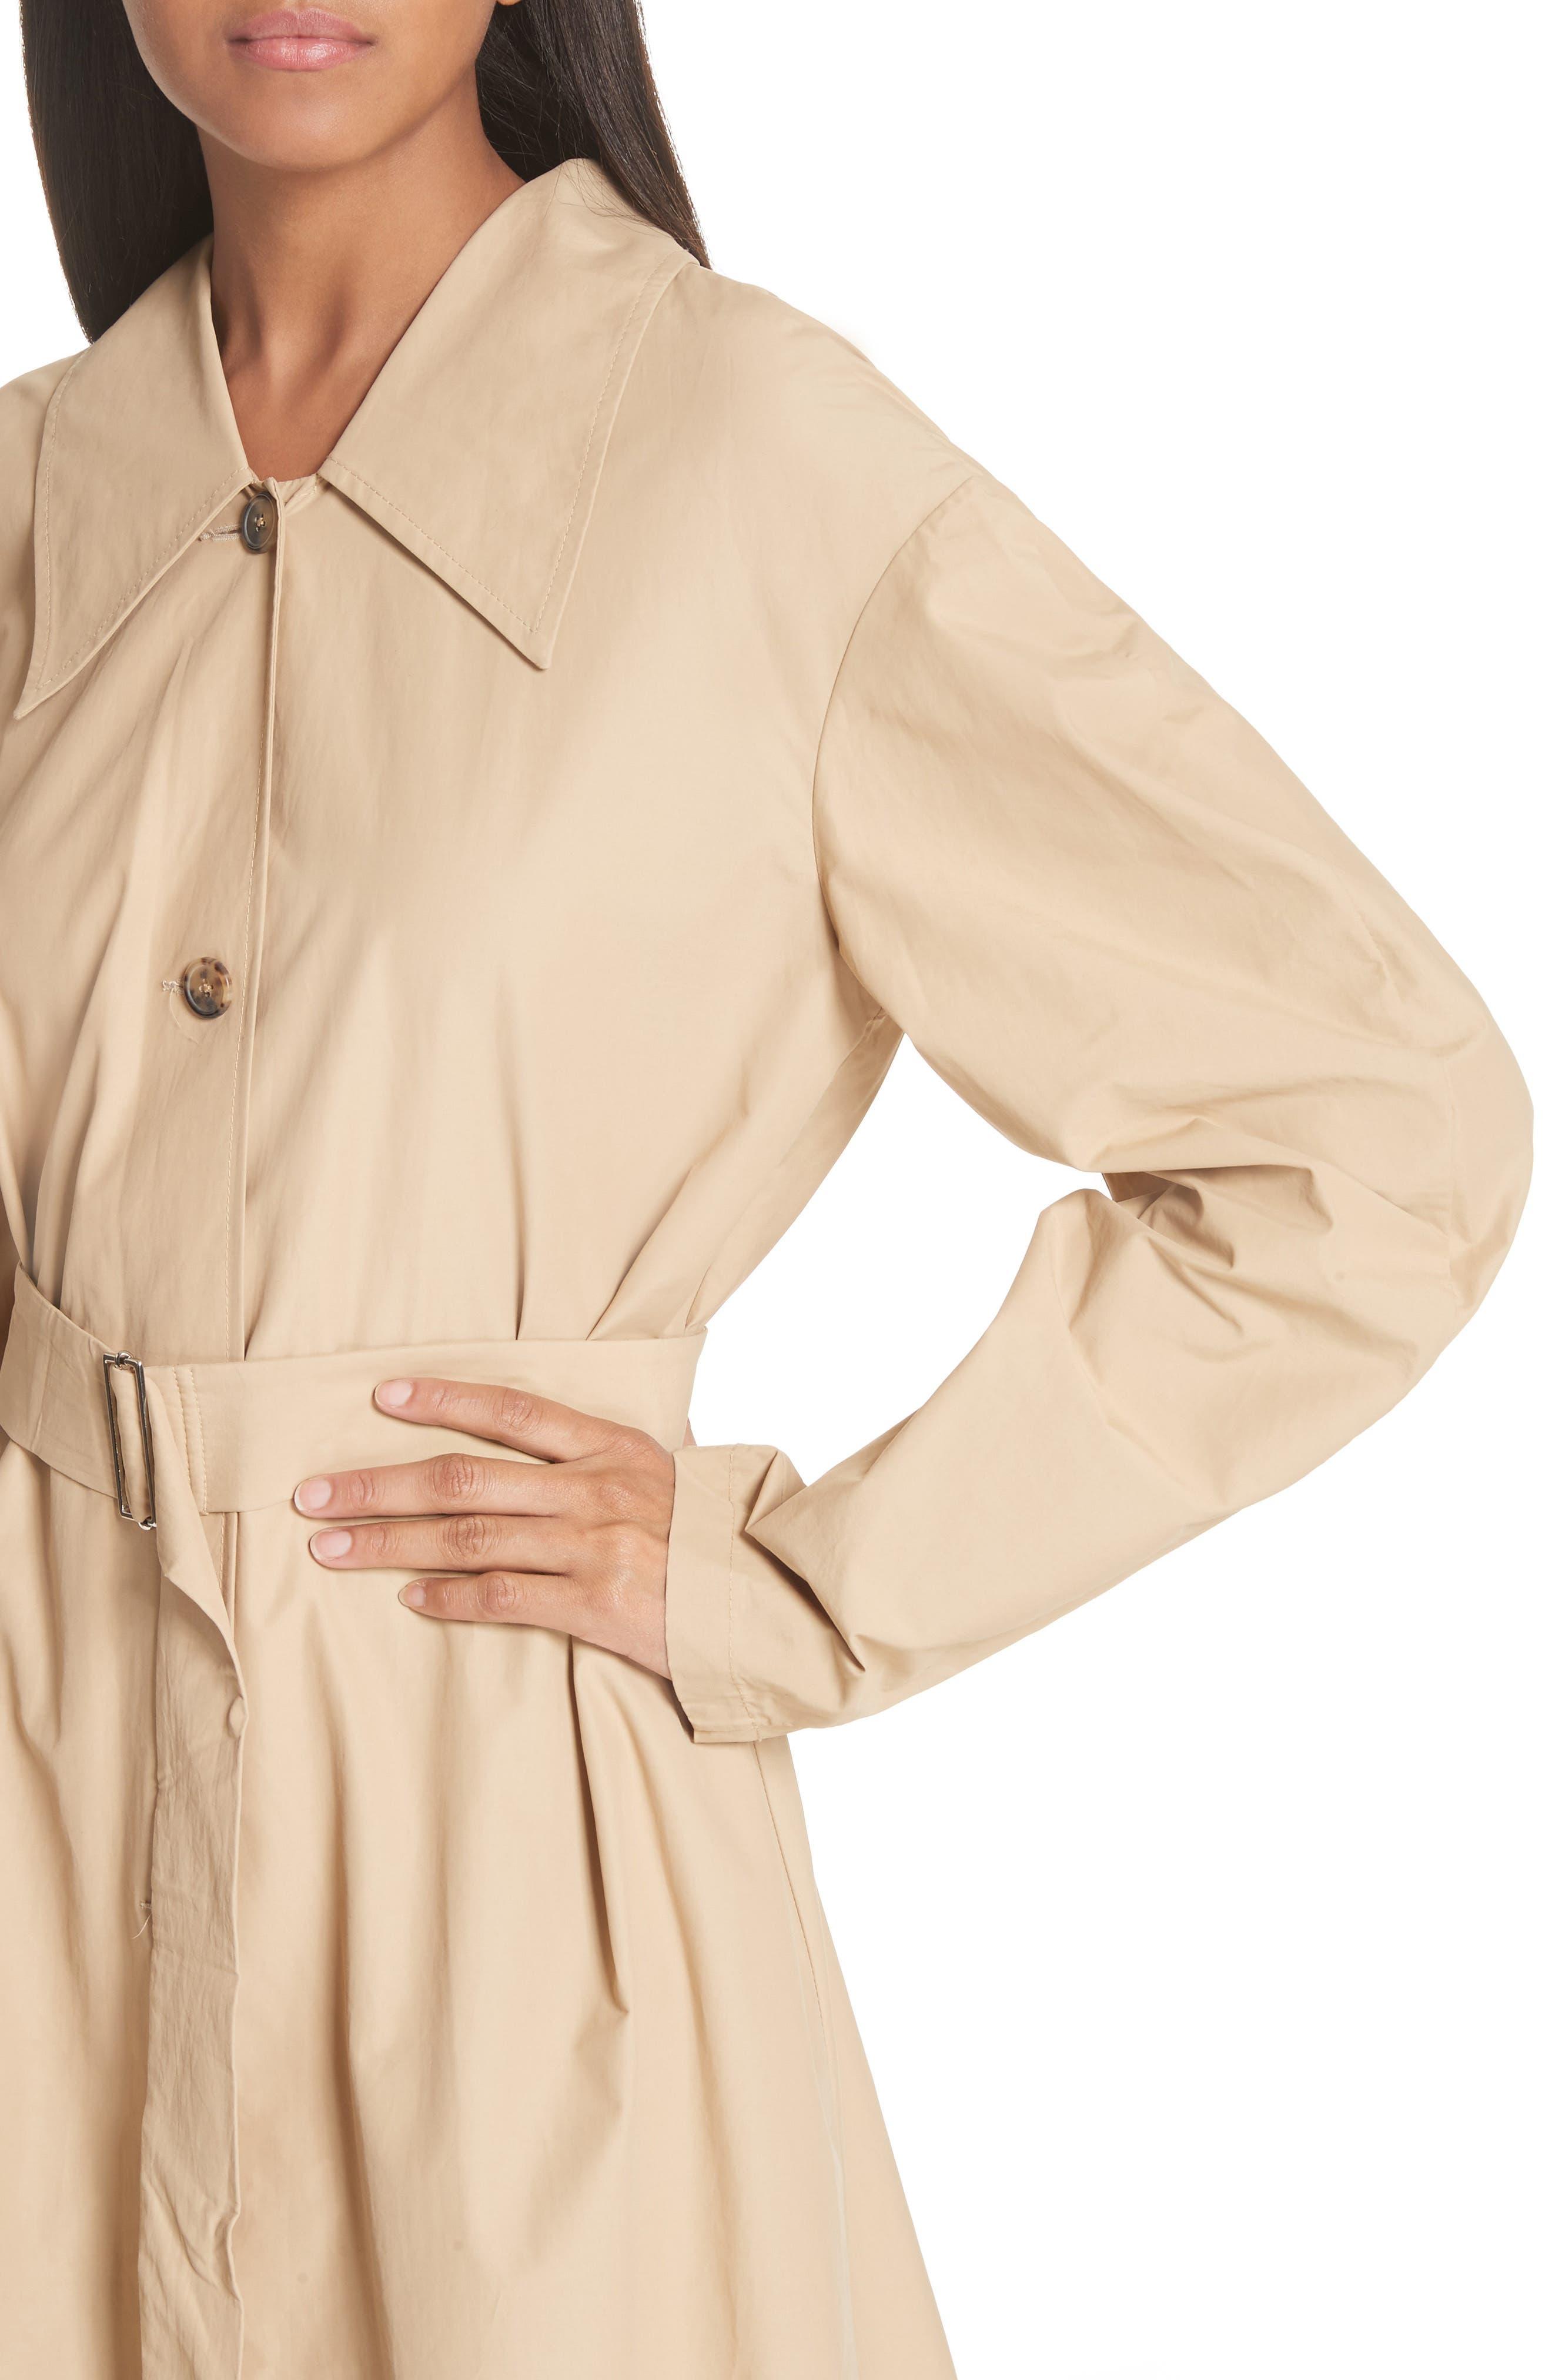 Round Sleeve Coat with Polka Dot Back Panel,                             Alternate thumbnail 4, color,